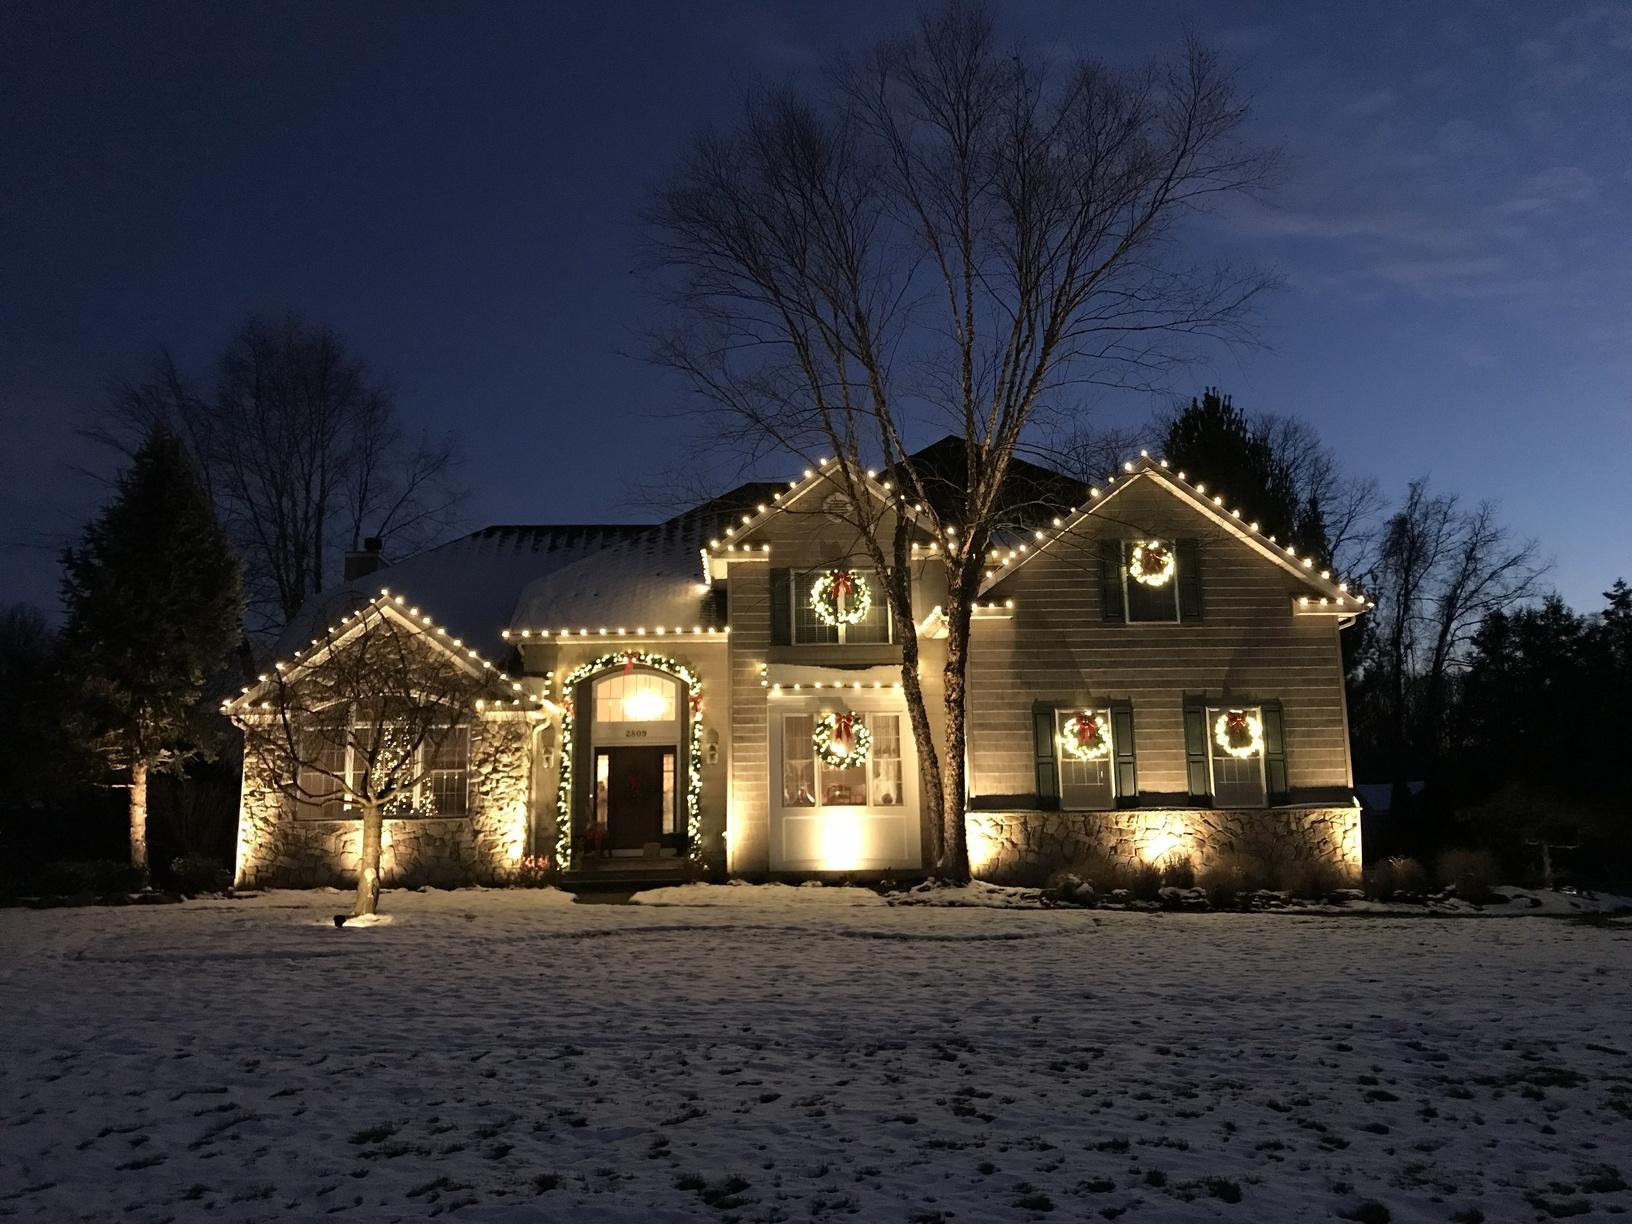 Christmas Light Display in Manasquan, NJ